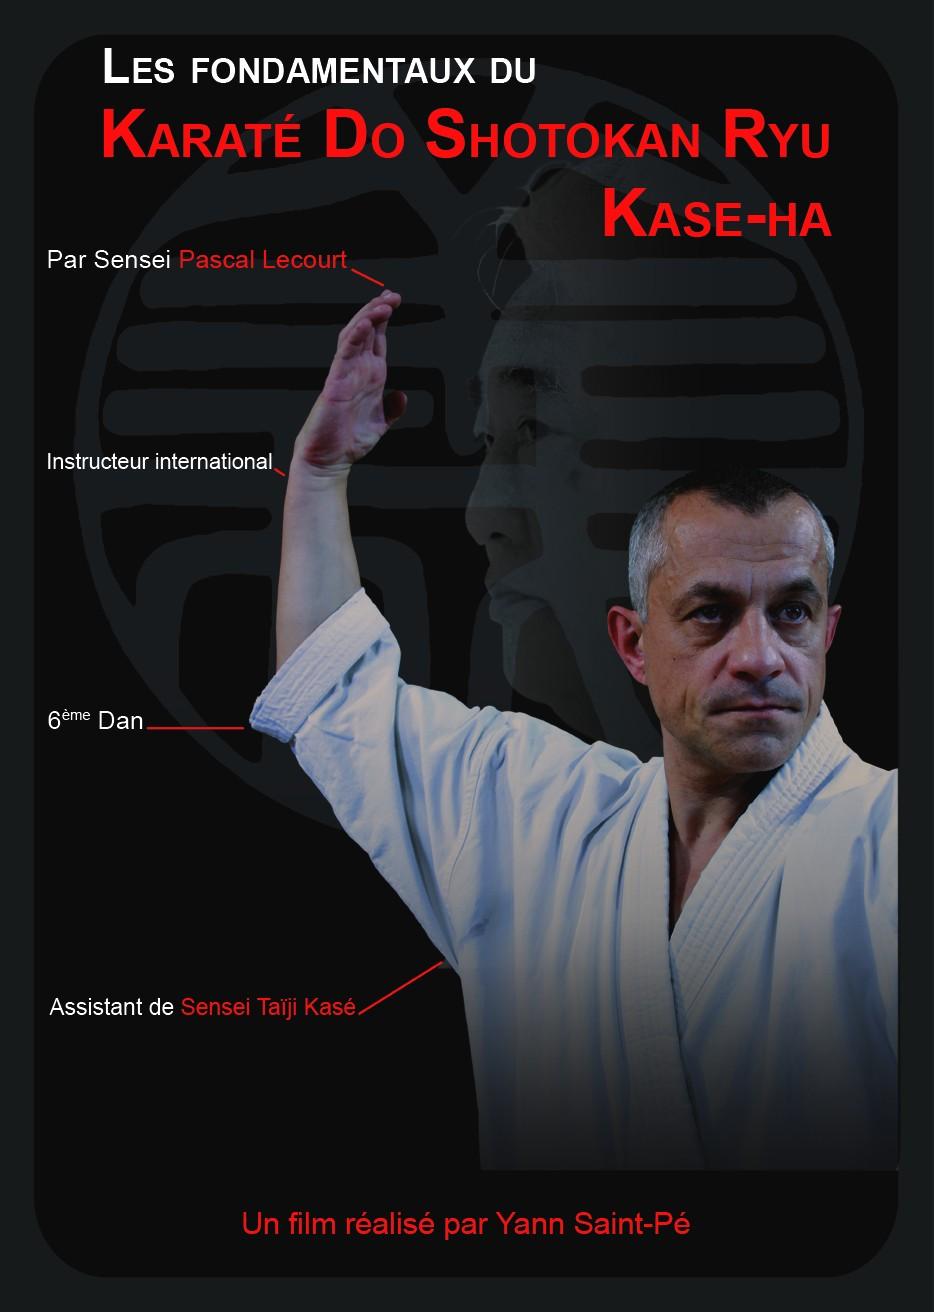 DVD Pascal Lecourt - Les fondamentaux du Karaté Do Shotokan Ryu Kase-Ha